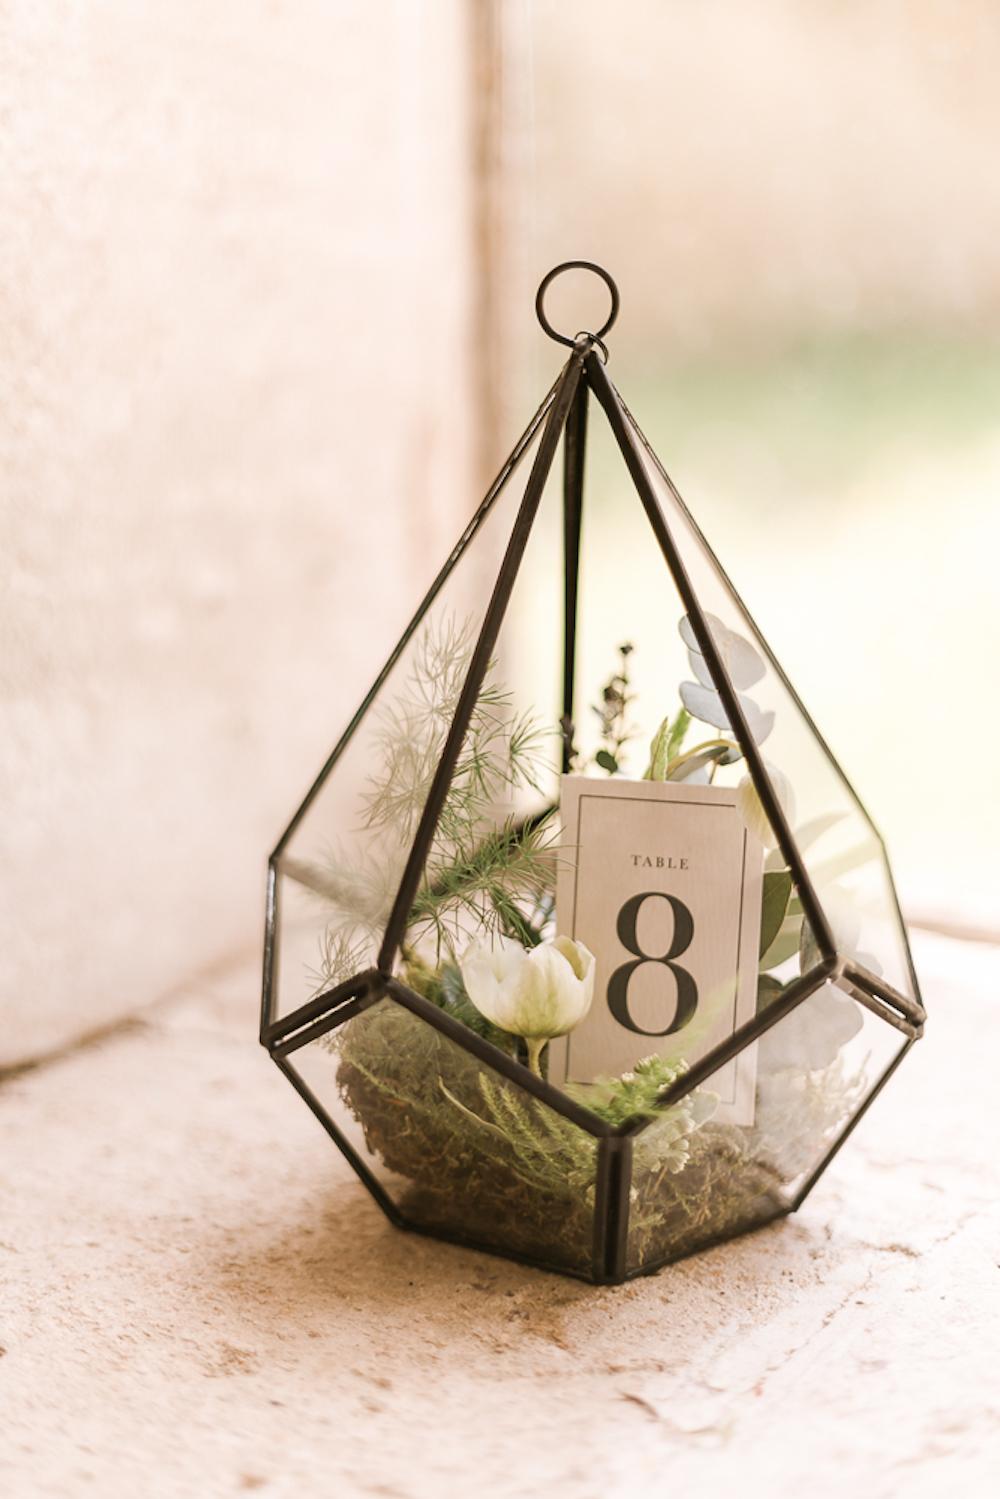 parisian-inspired-blog-mariage-shooting-inspiration-vegetal-abbaye-trois-fontaines-marne-cg-photographie-15.jpg